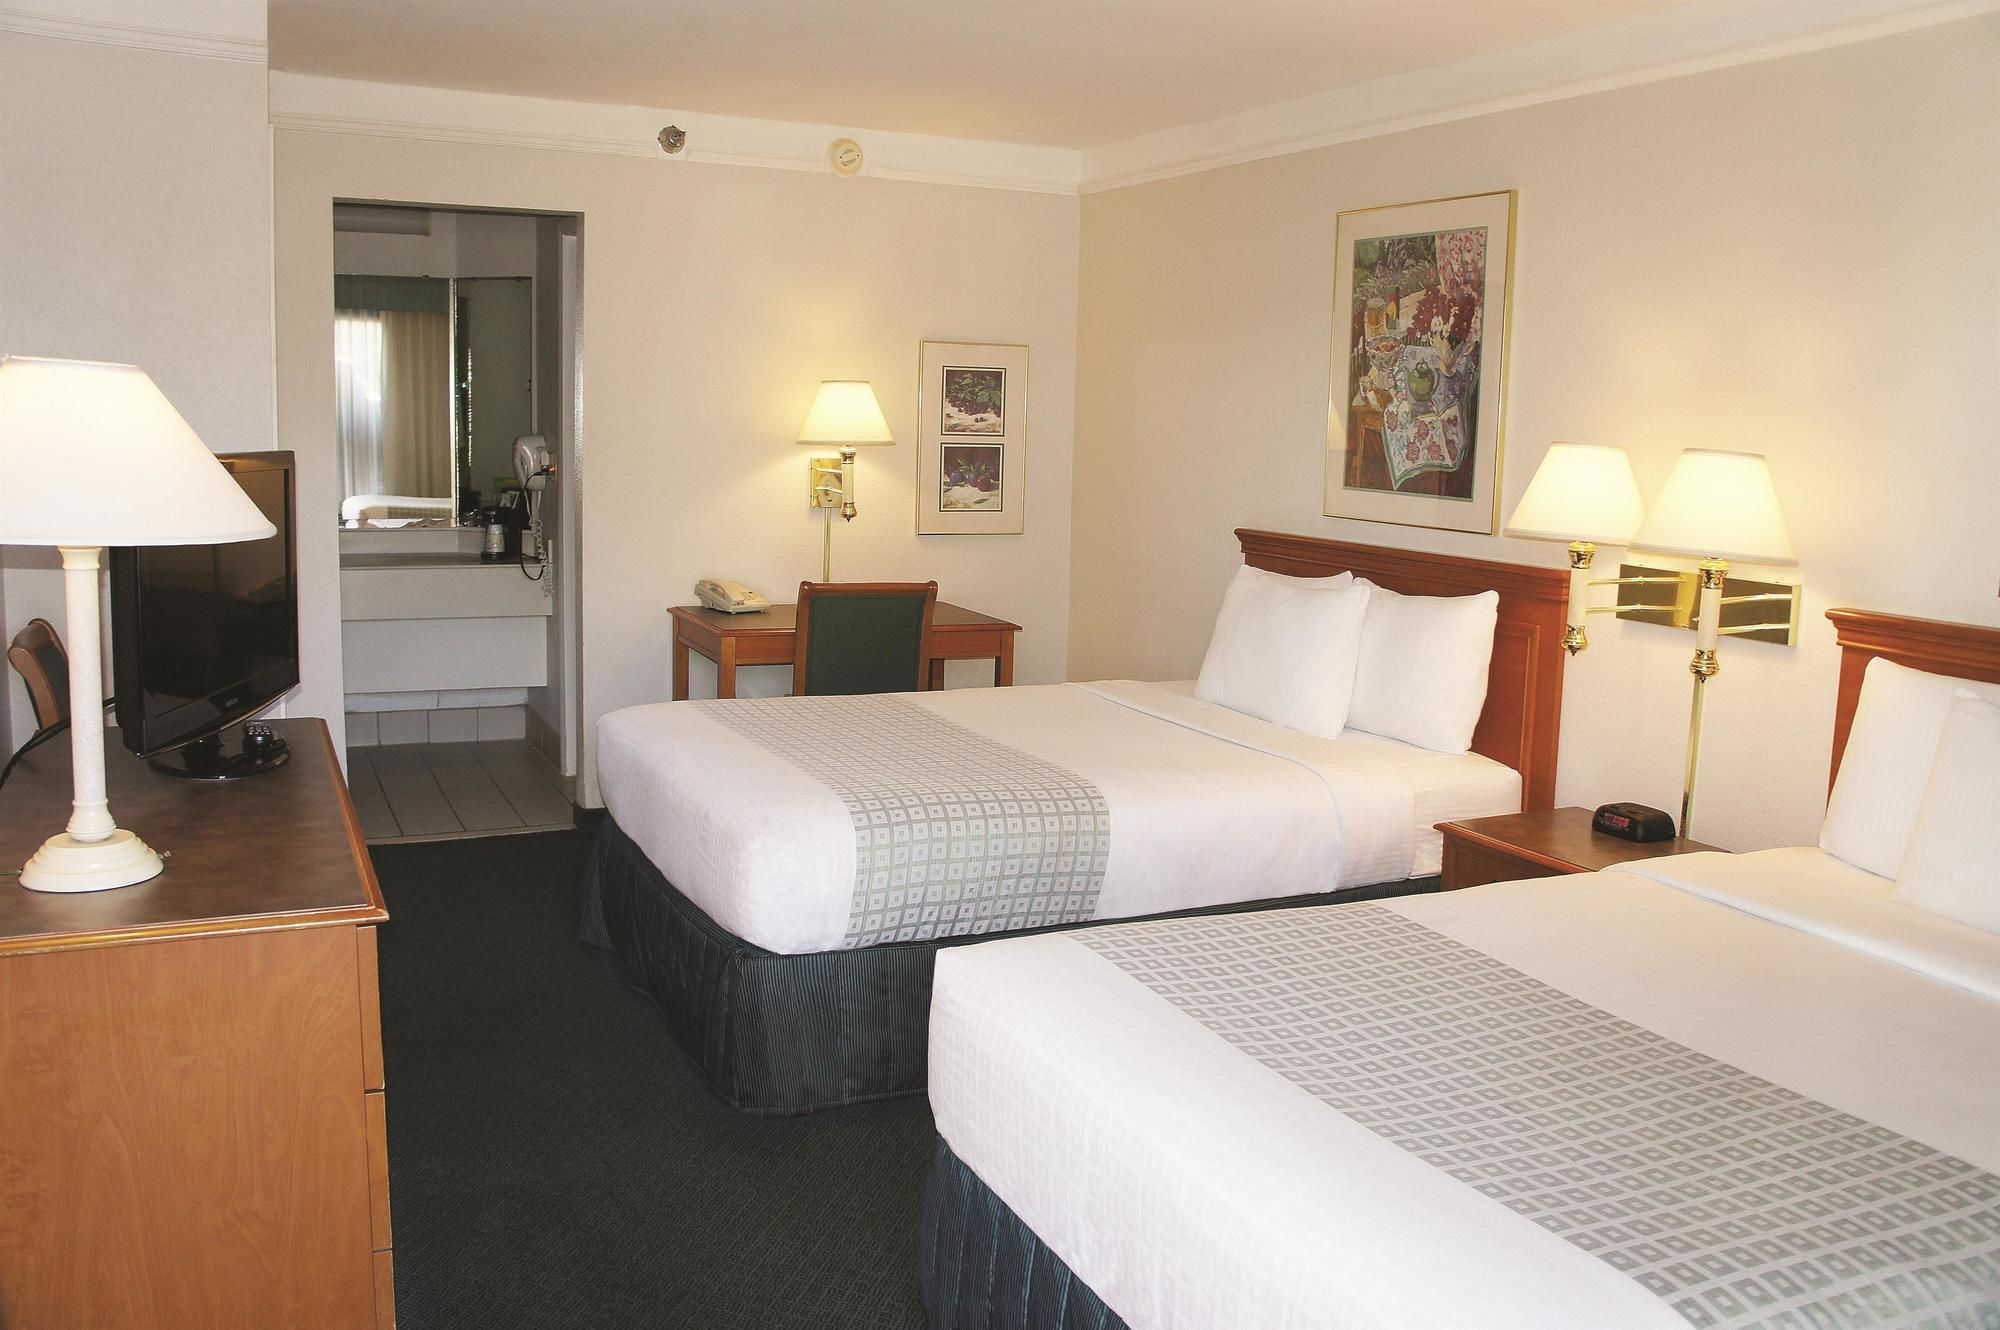 LaQuinta Inn in Savannah, GA